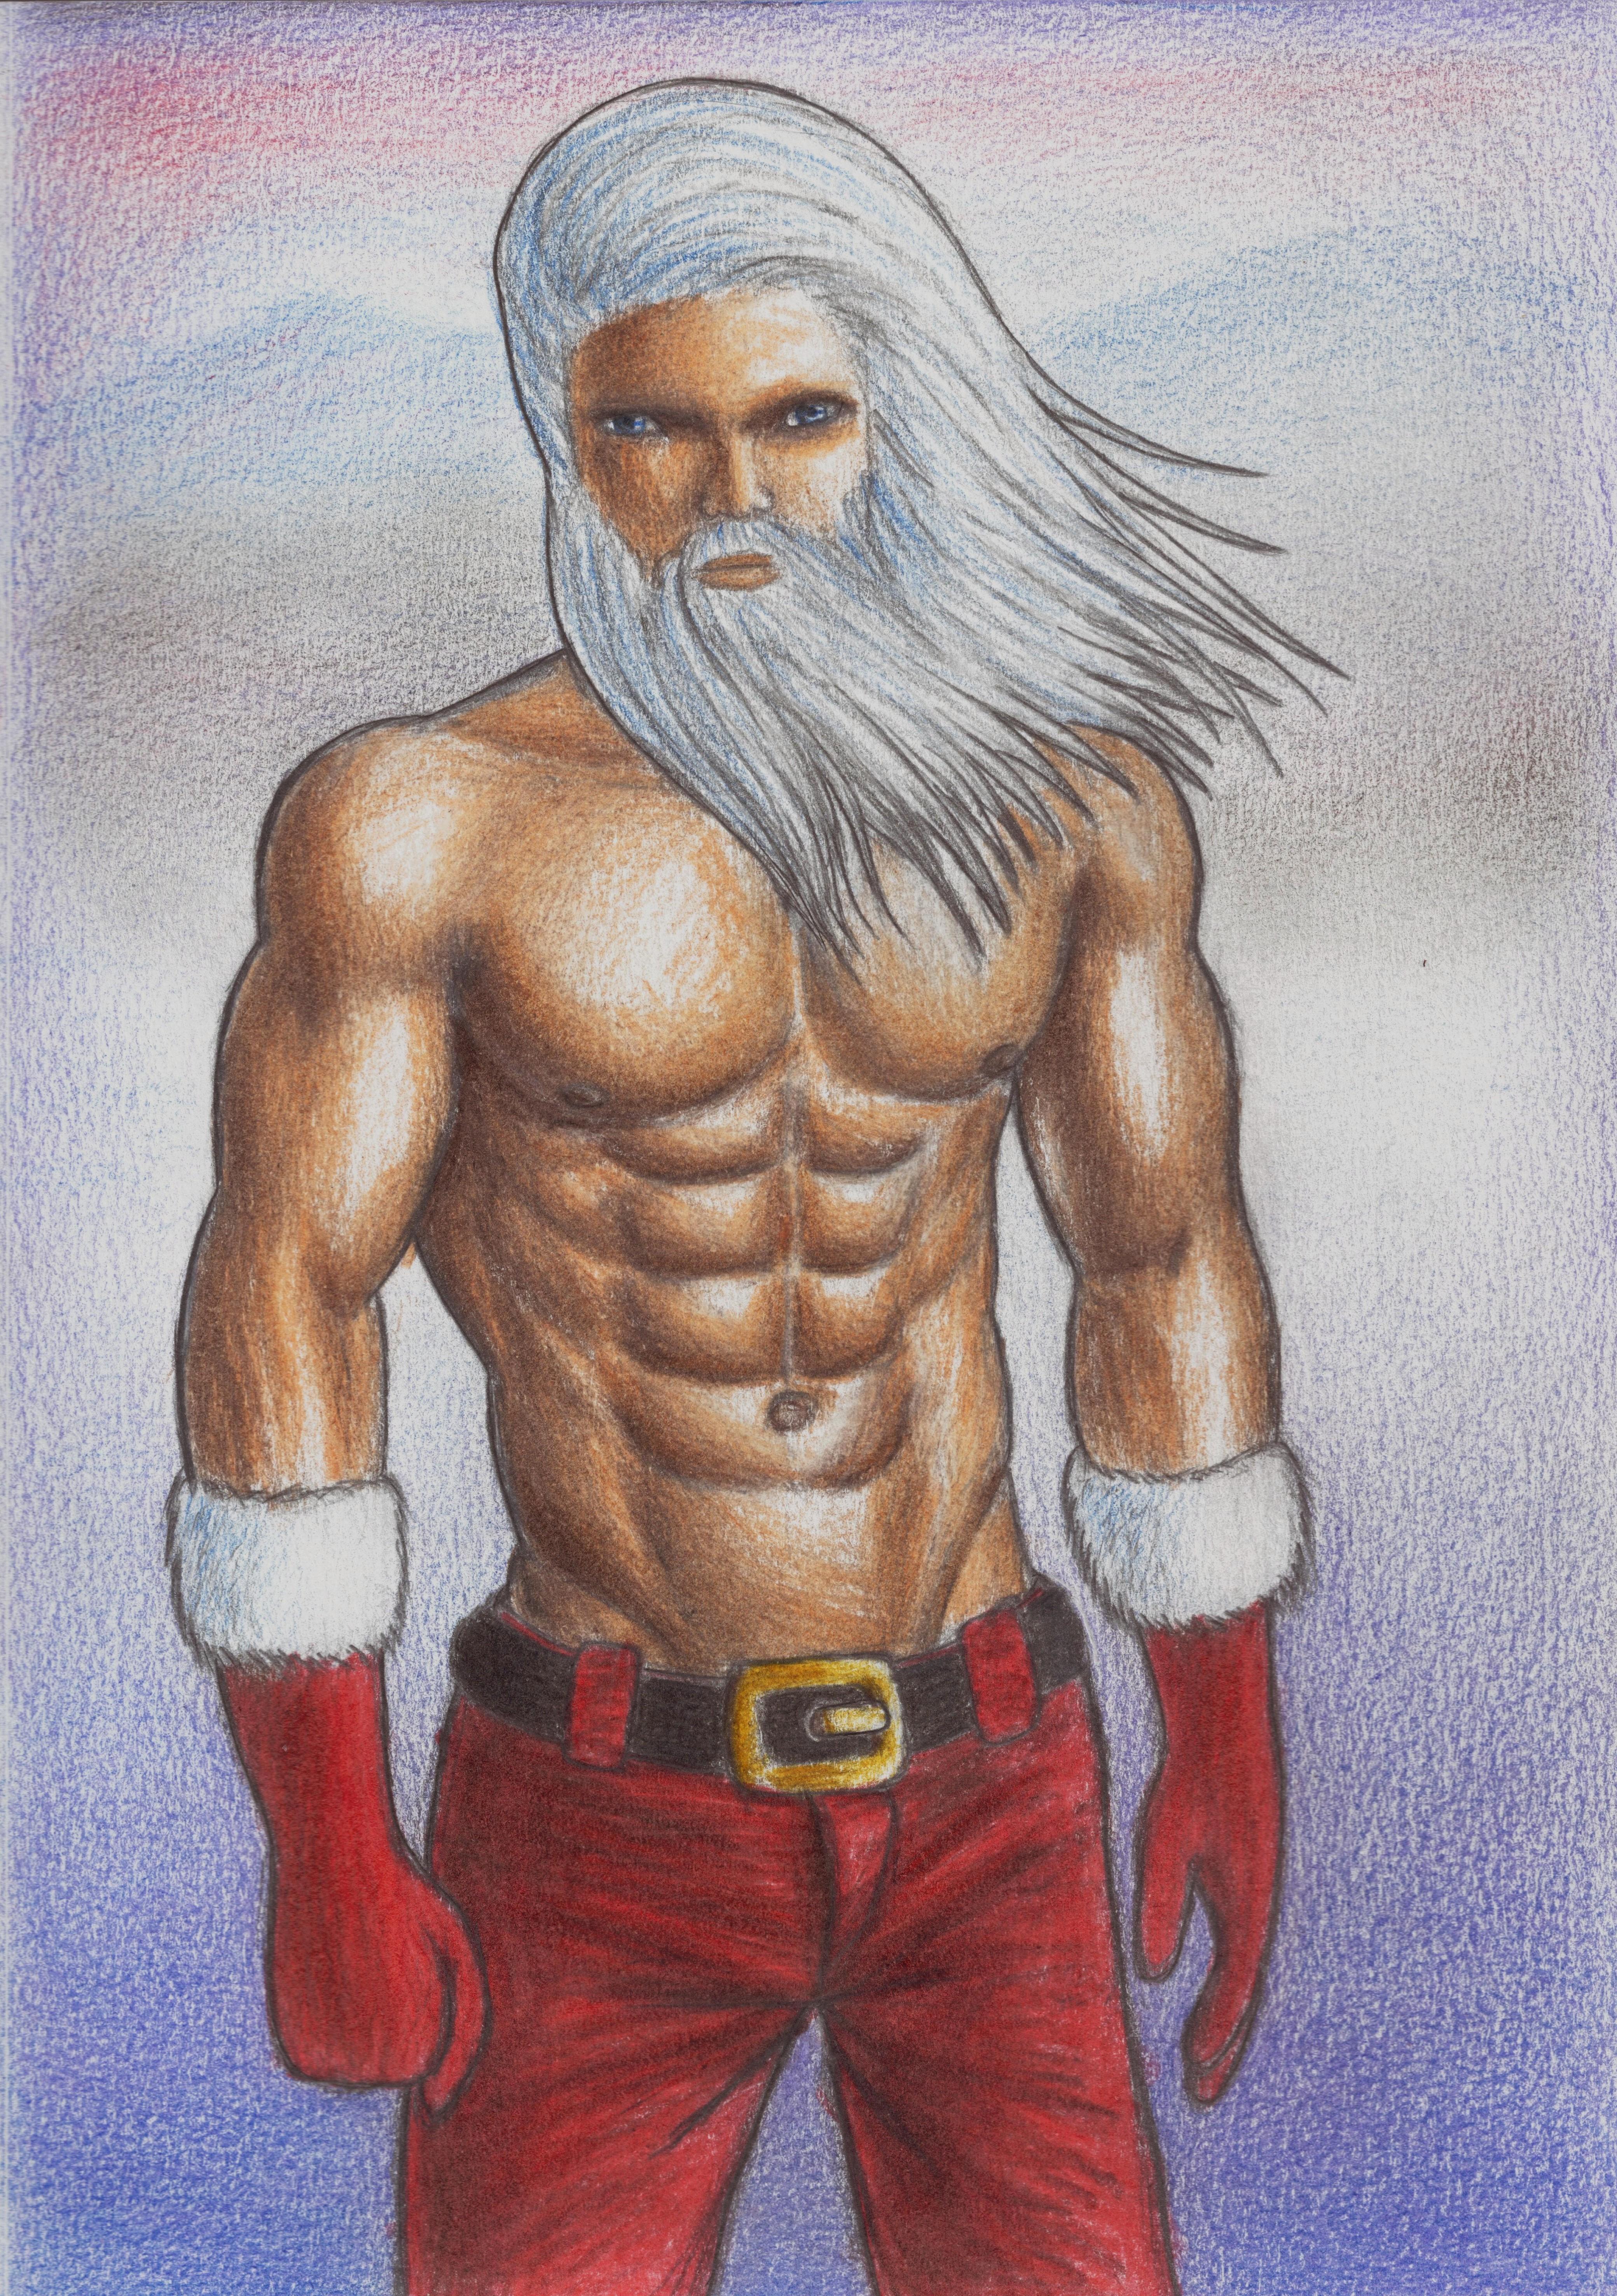 Santa's Epic Transformation